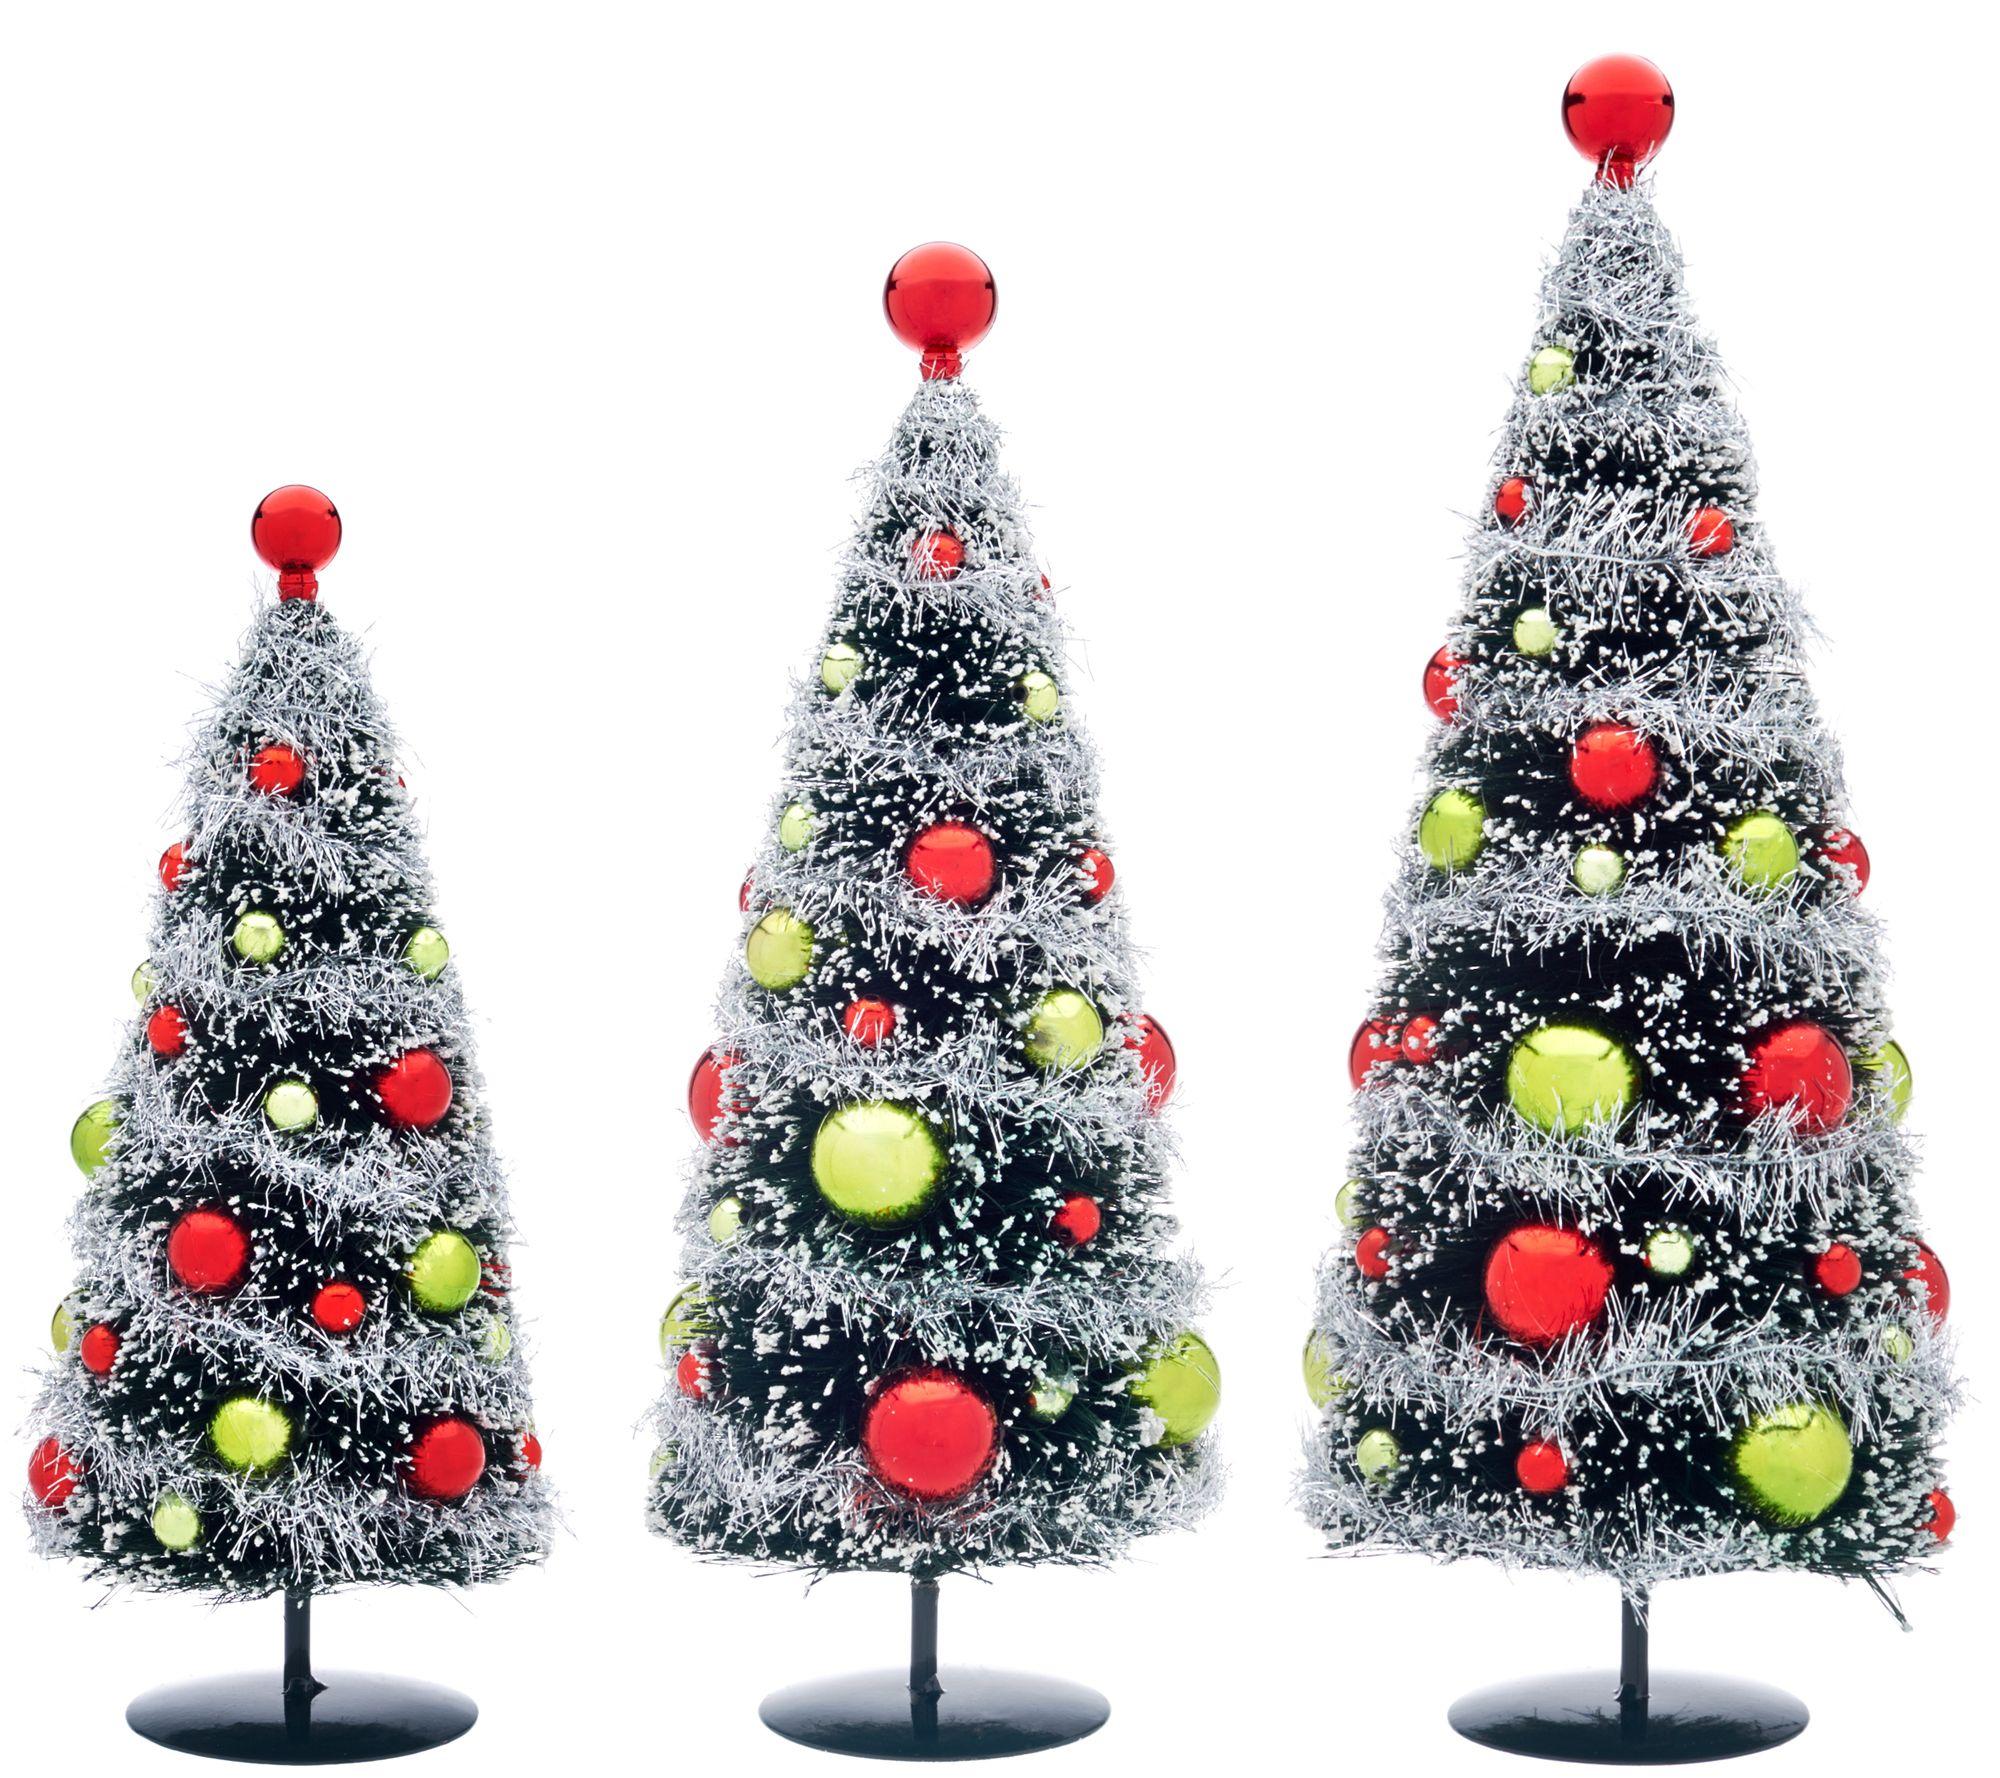 Ellens Qvc Christmas Tree Ornaments Aqndgg Newyearland2020 Info